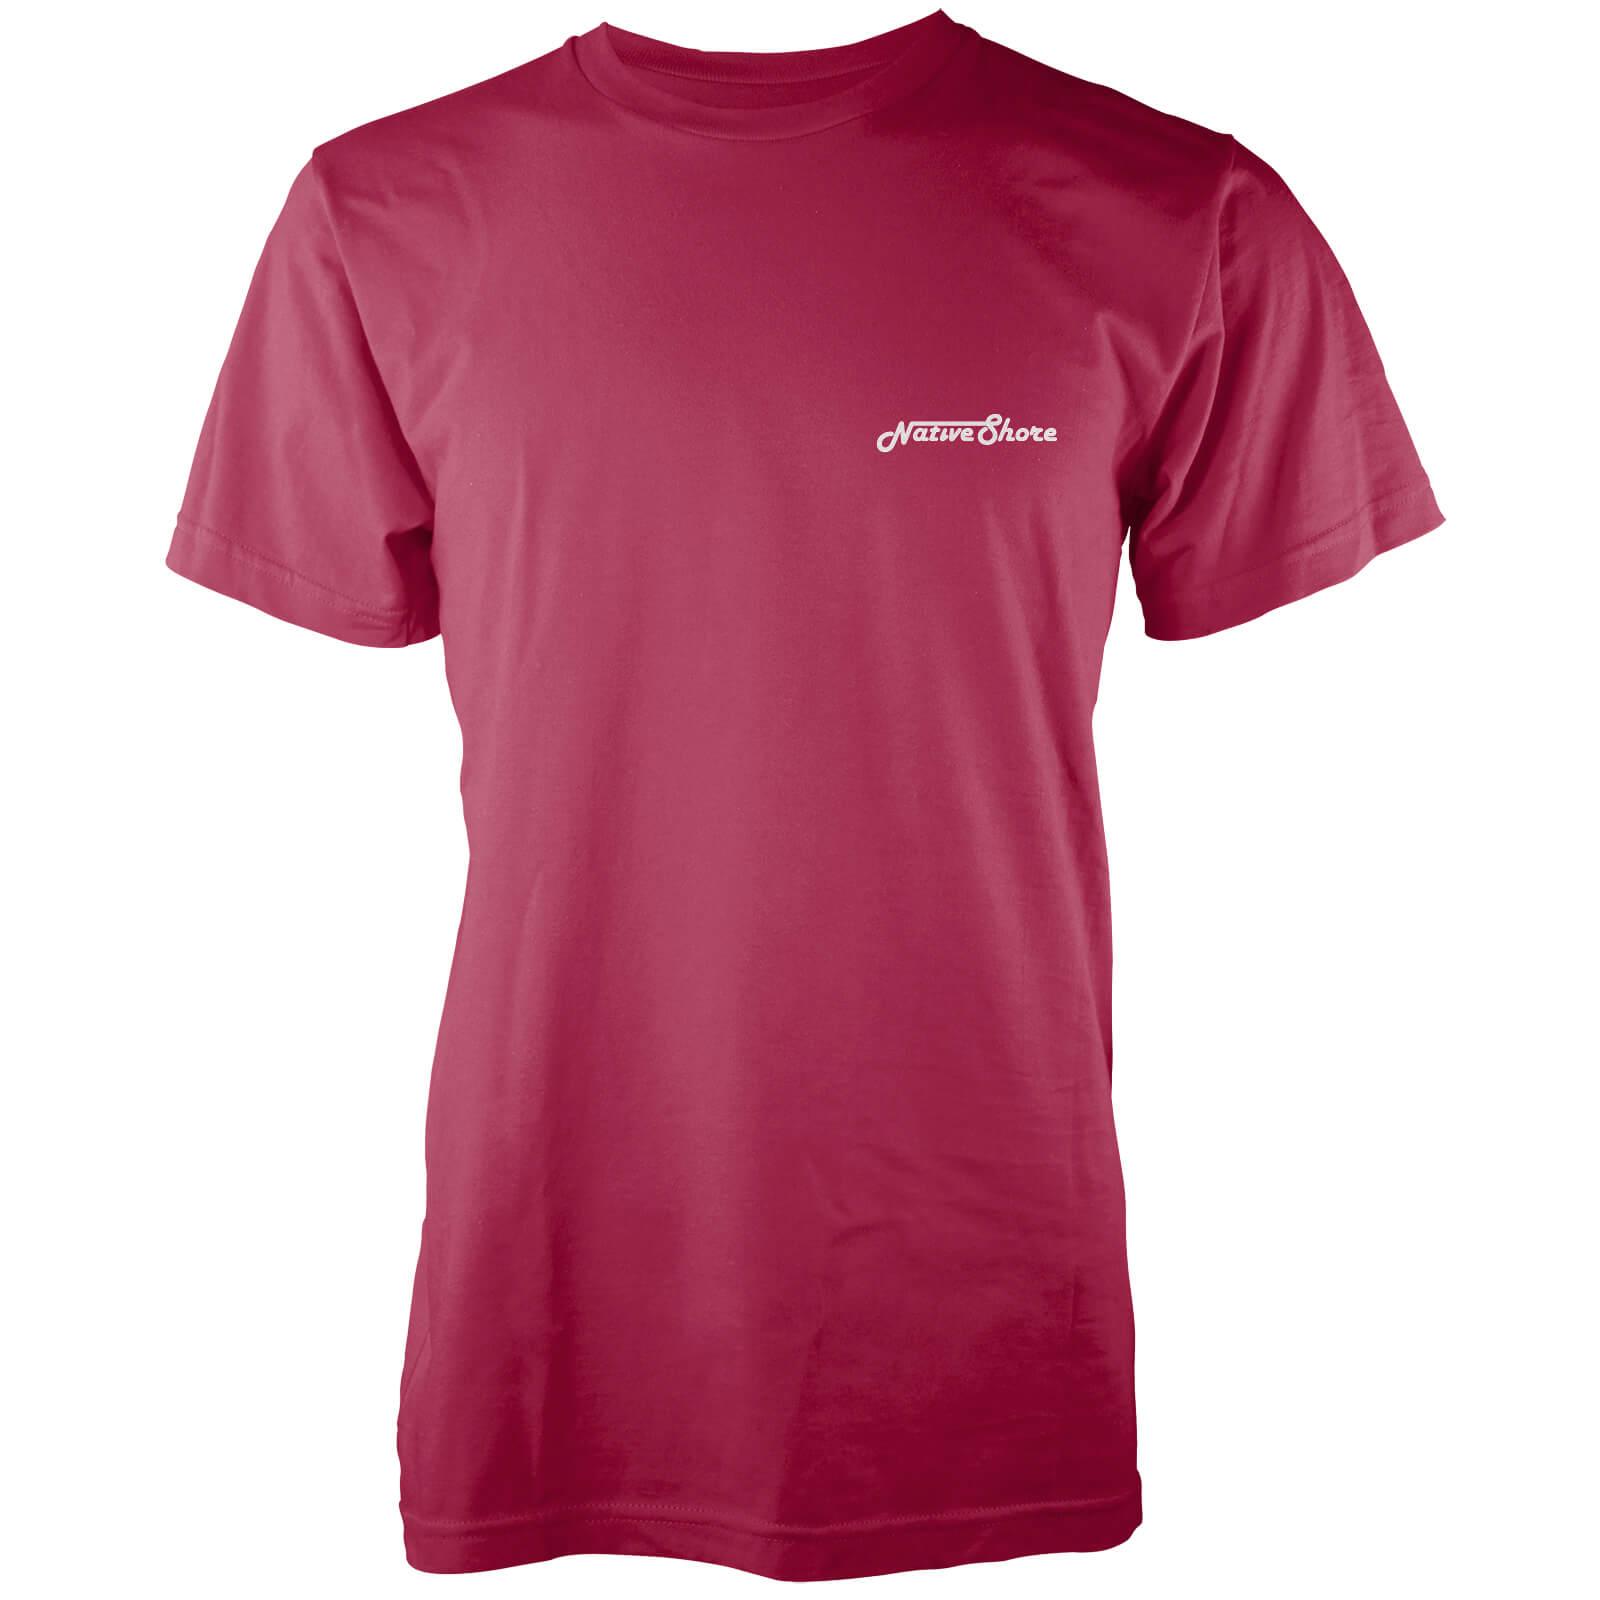 Camiseta Native Shore Core Logo - Hombre - Rojo Clothing  57b4886313e04